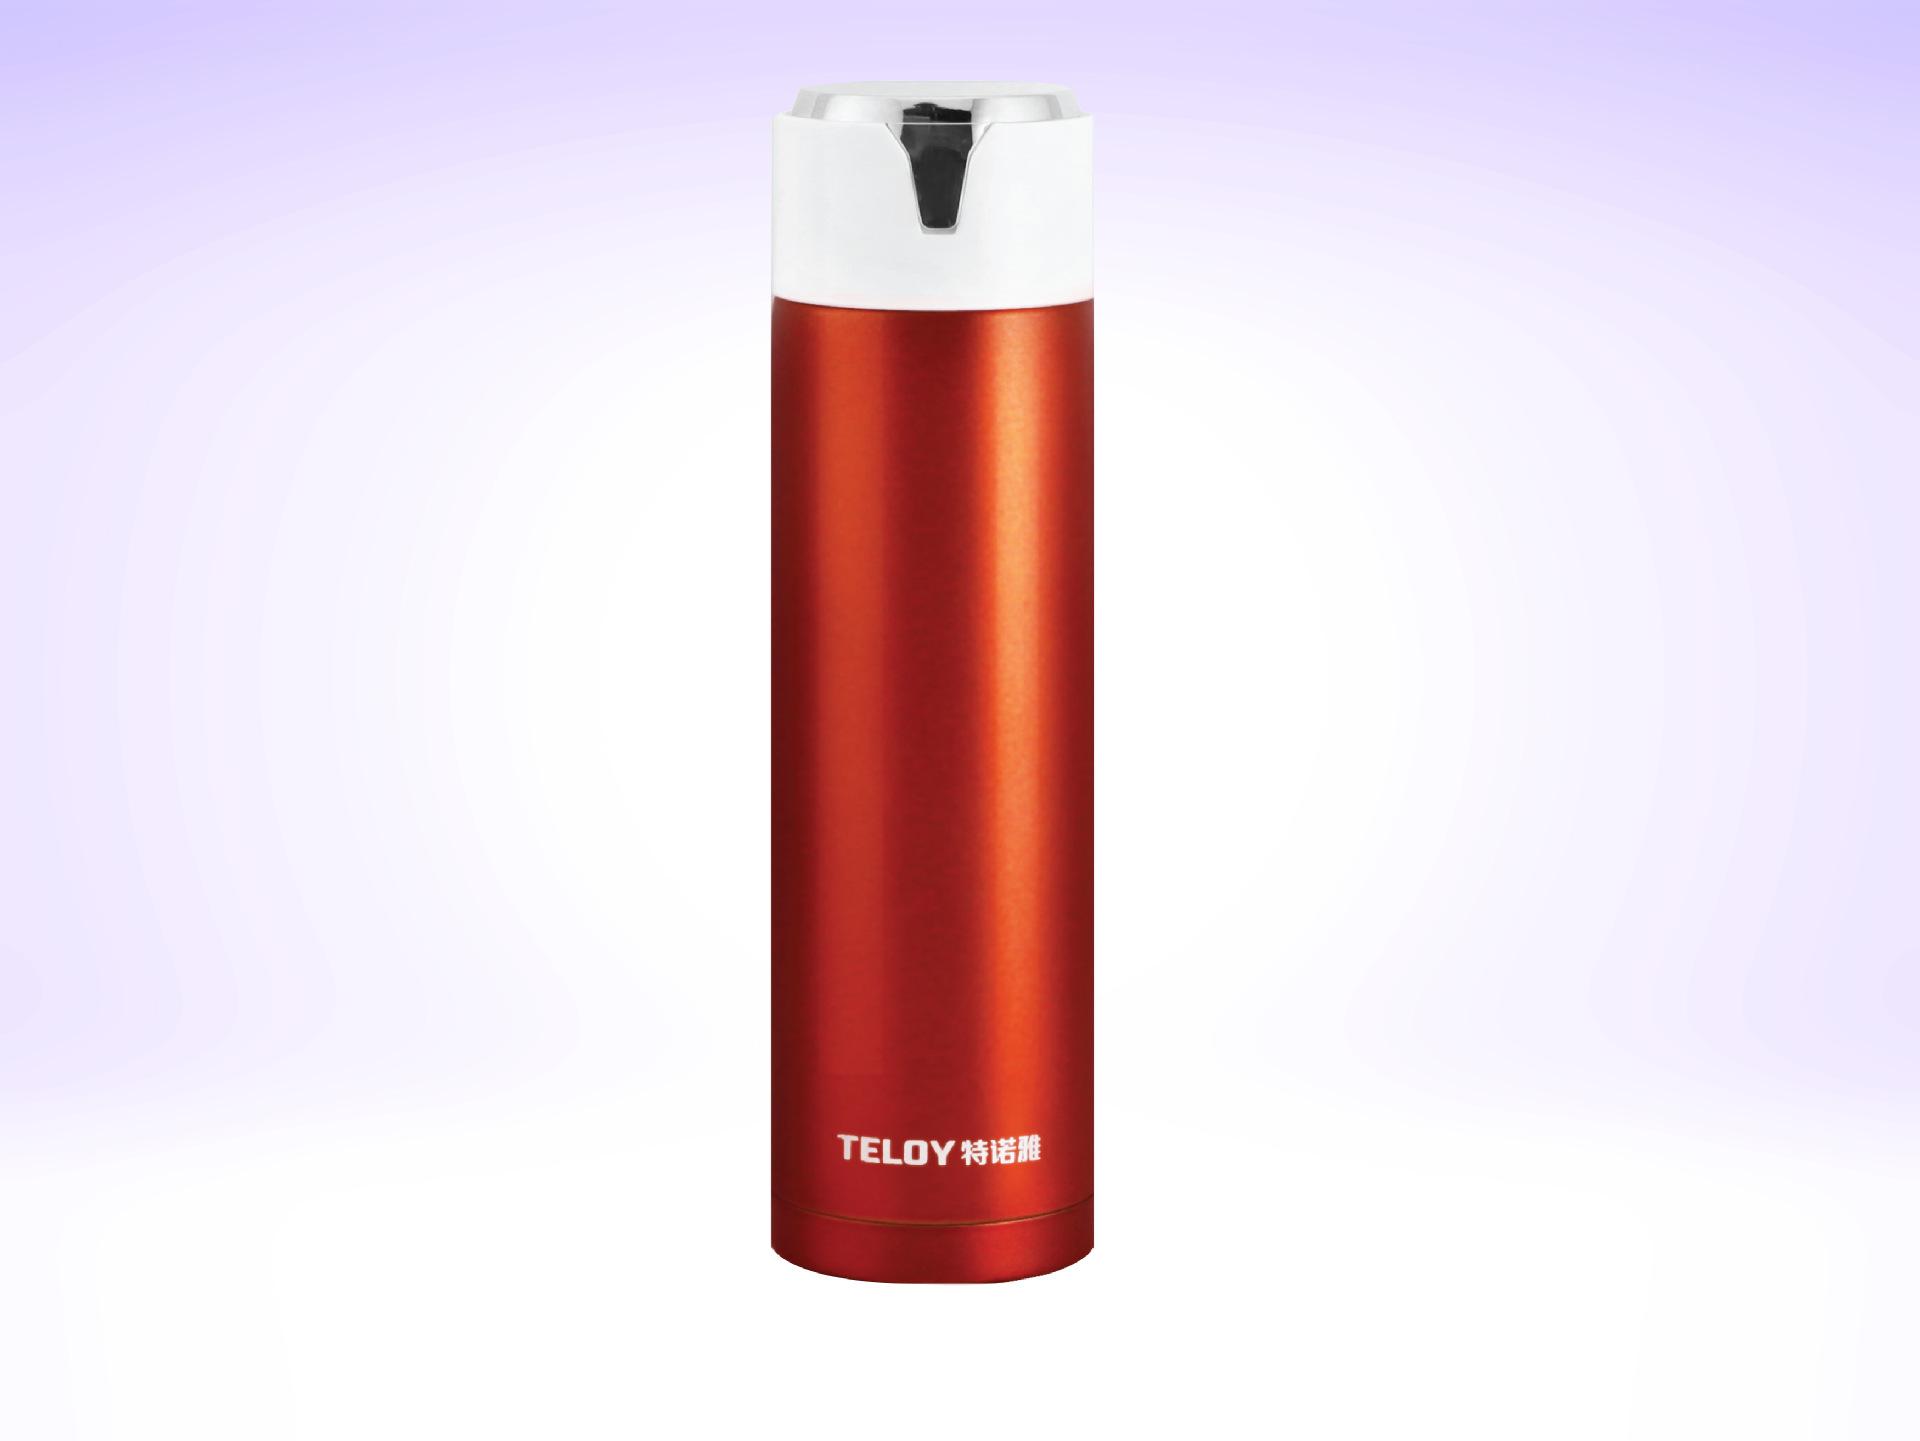 TELOY特诺雅 新款真空保温杯 优质不锈钢 王哲林代言D-50012-300